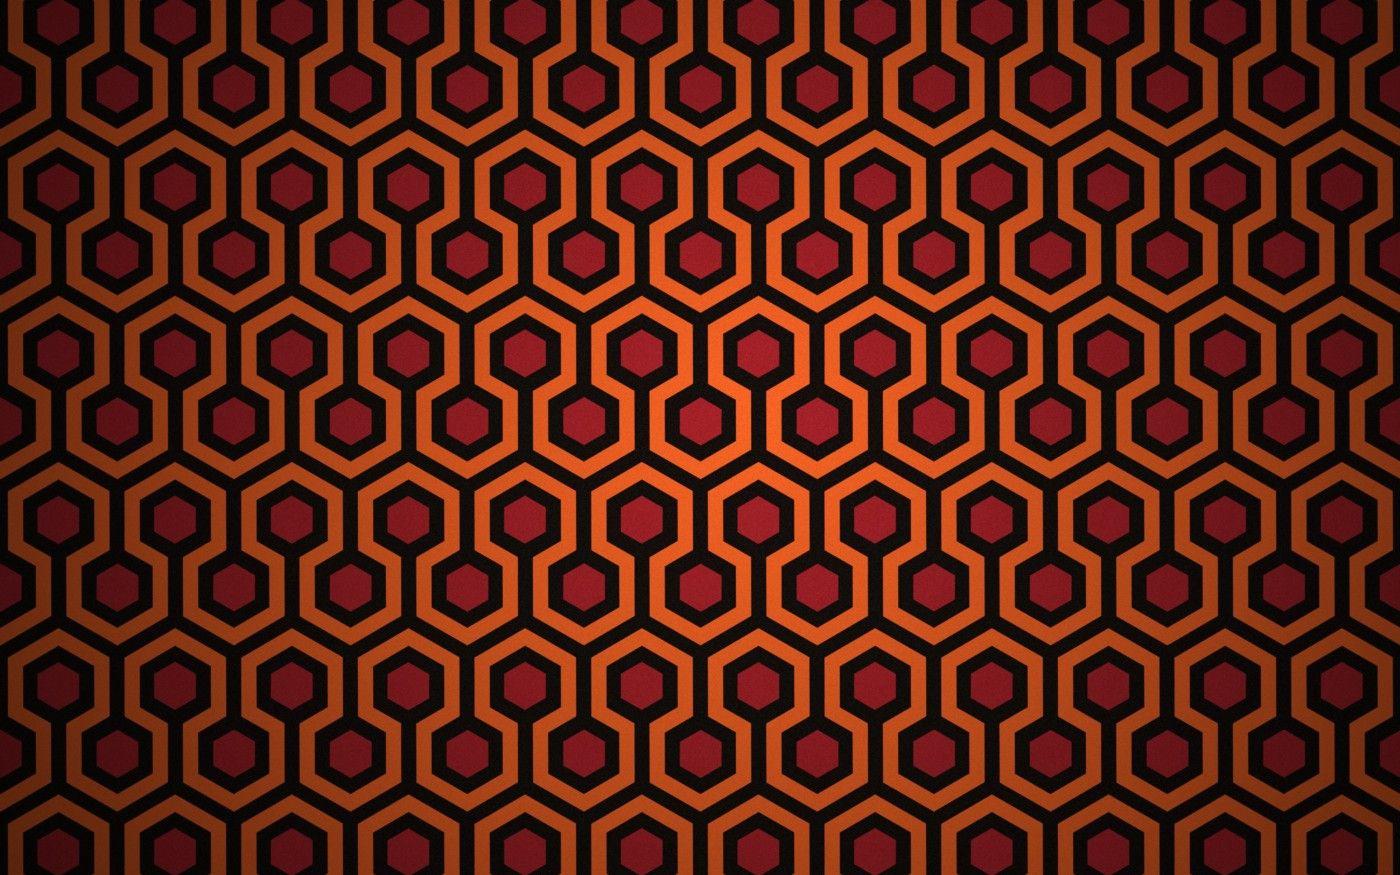 1 0tfrjtnyzezygfdzqz Cnq Jpeg 1 400 875 Pixels Patterned Carpet